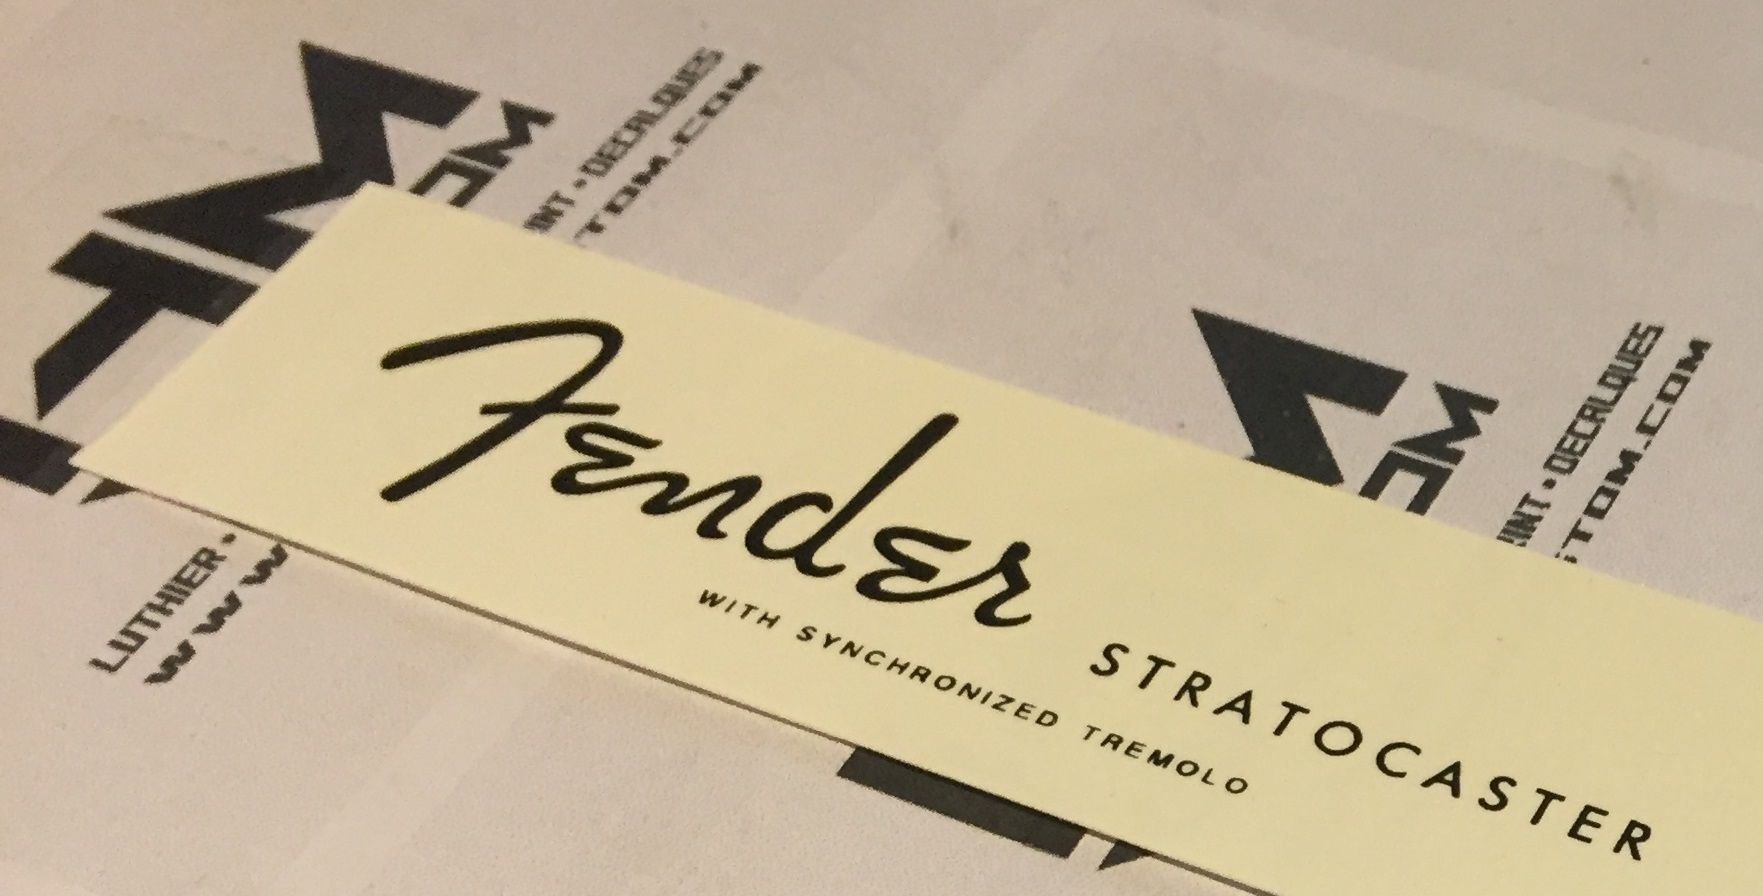 Fender Stratocaster With Synchronized Tremolo Custom WaterSlide Headstock  Logo.